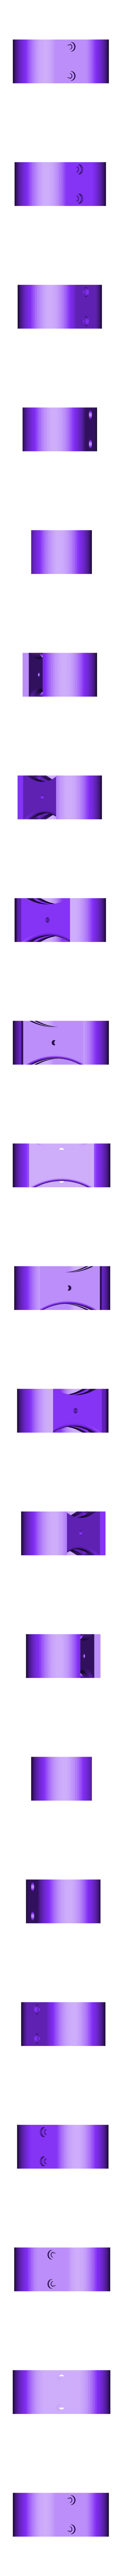 Watch Stand Gyro.stl Télécharger fichier STL Gyro Winder / Watch Winder / Remontoir Montre • Objet pour impression 3D, NedalLive